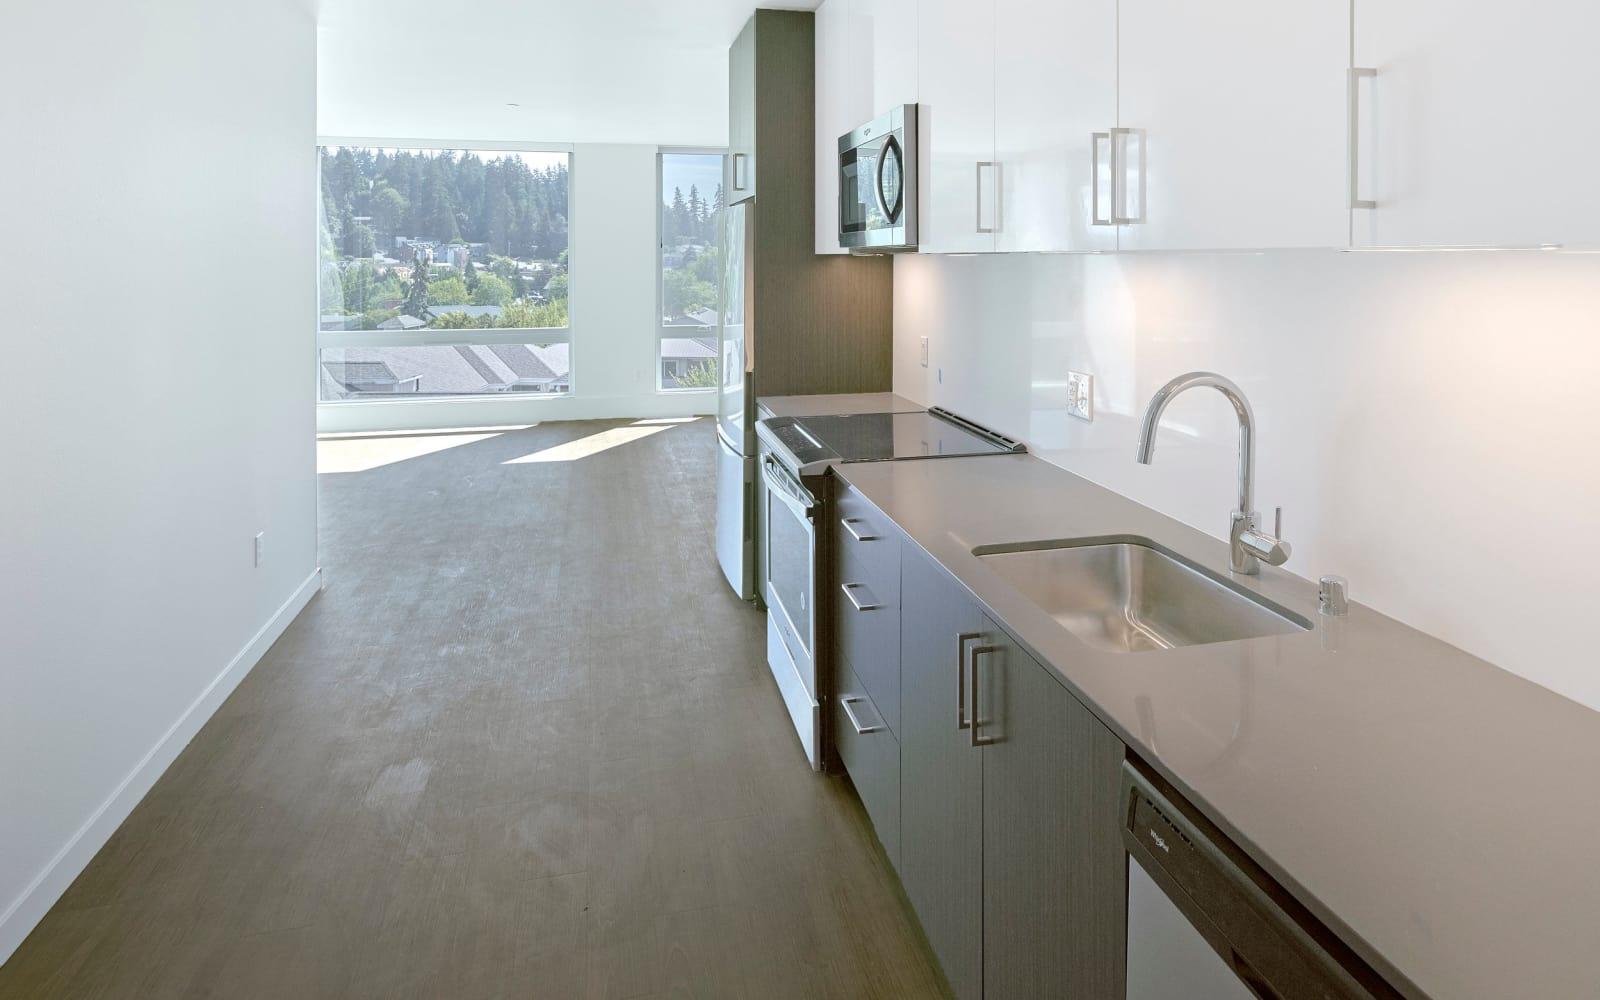 Photos of Station House Apartments in Redmond, Washington